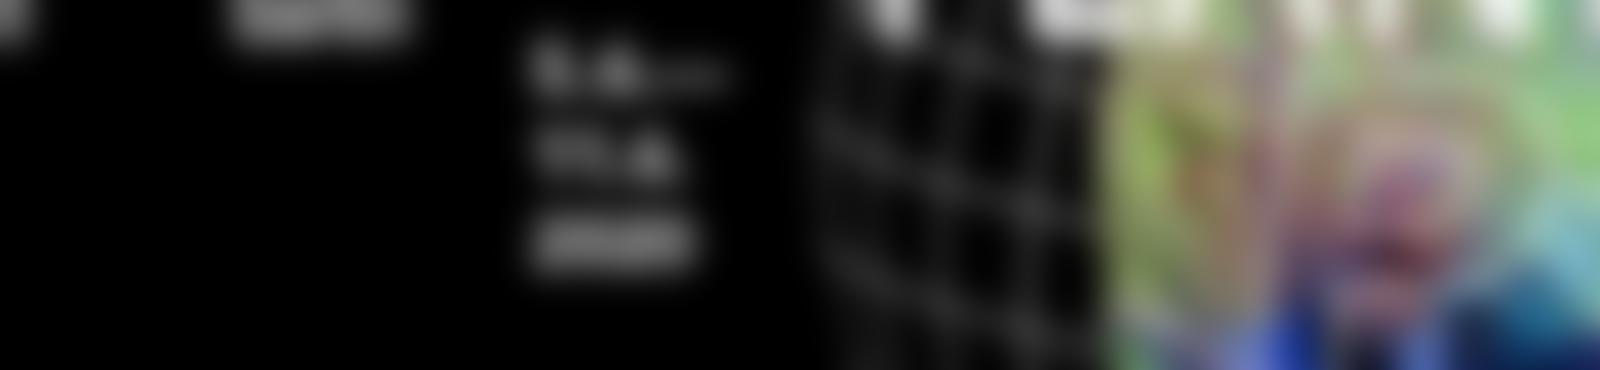 Blurred 84c716b1 b95b 4d4d 9a1e 4b6eafc69ea3